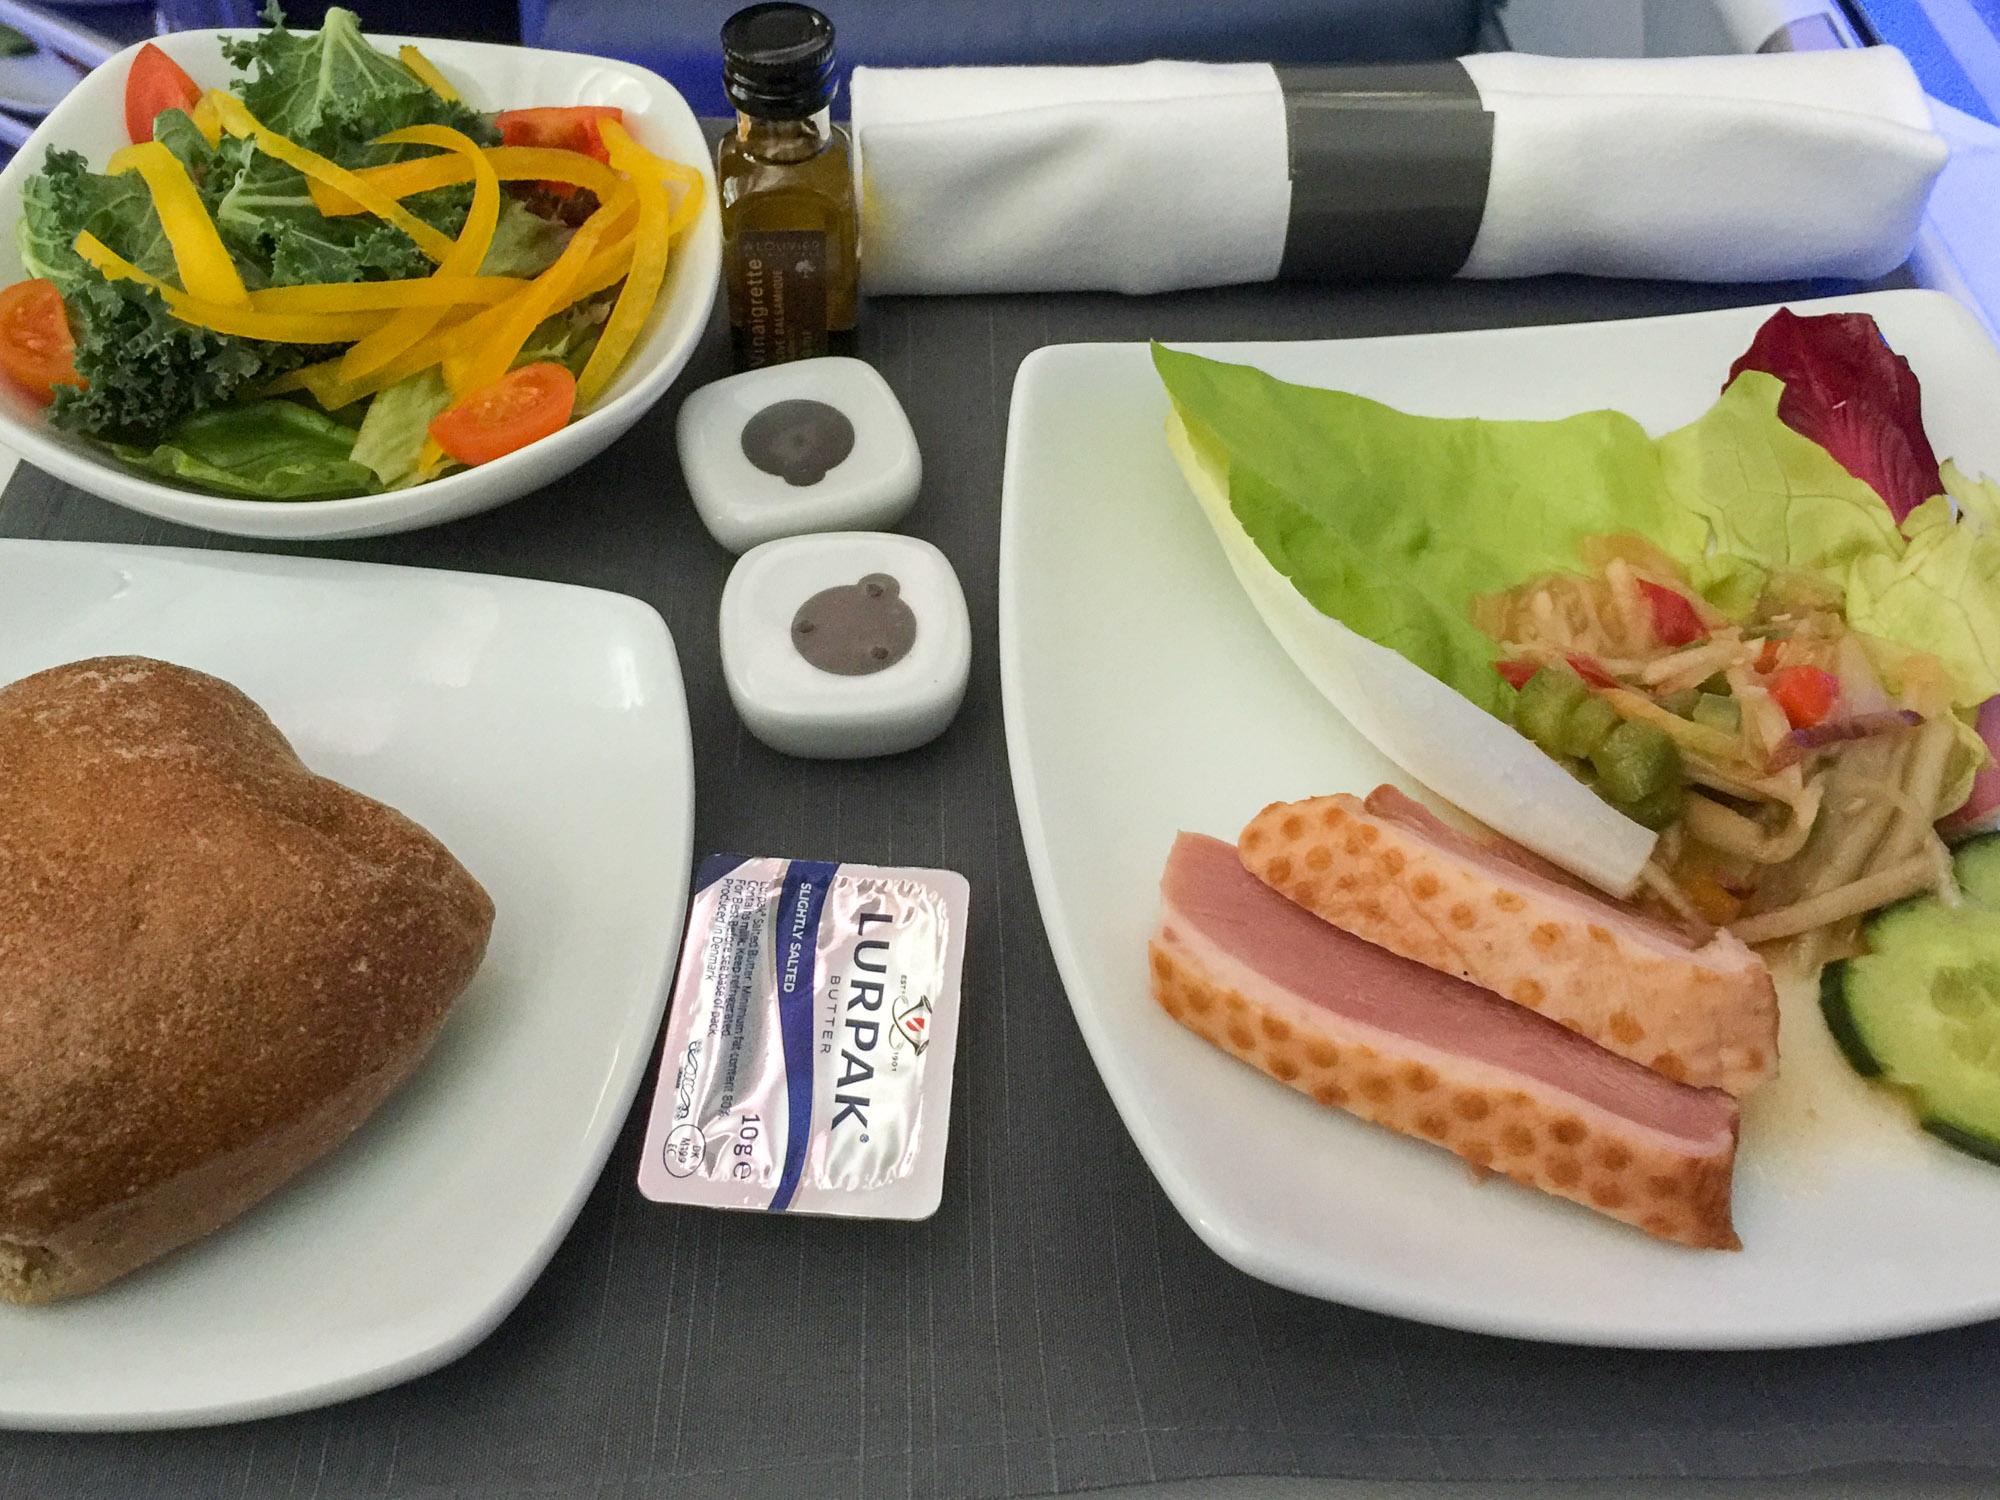 Smoked duck endive salad on AC34